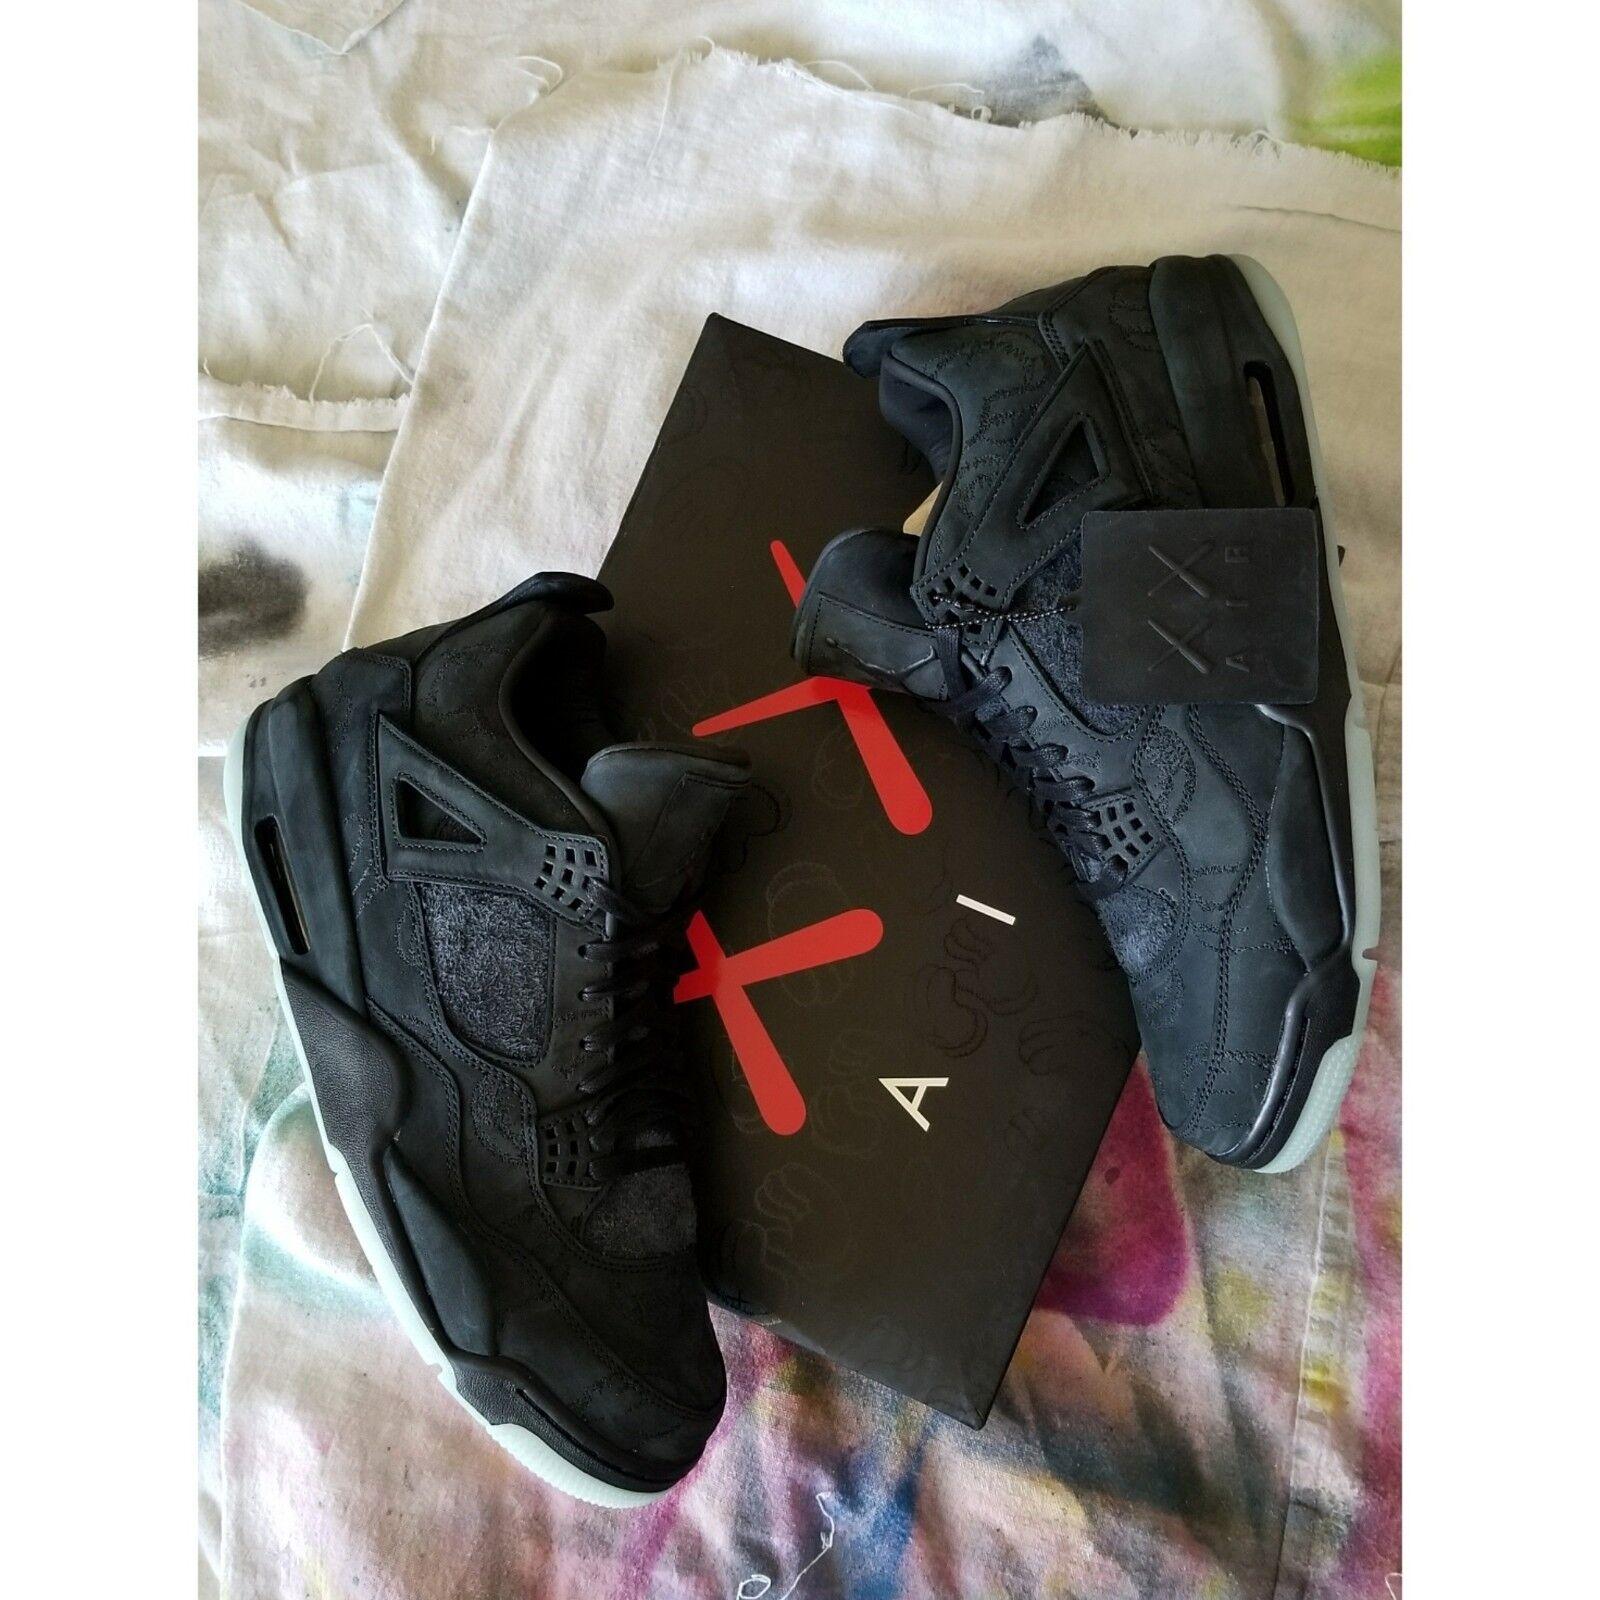 KAWS x AIR JORDAN NIKE 4 Black RETRO, size 12